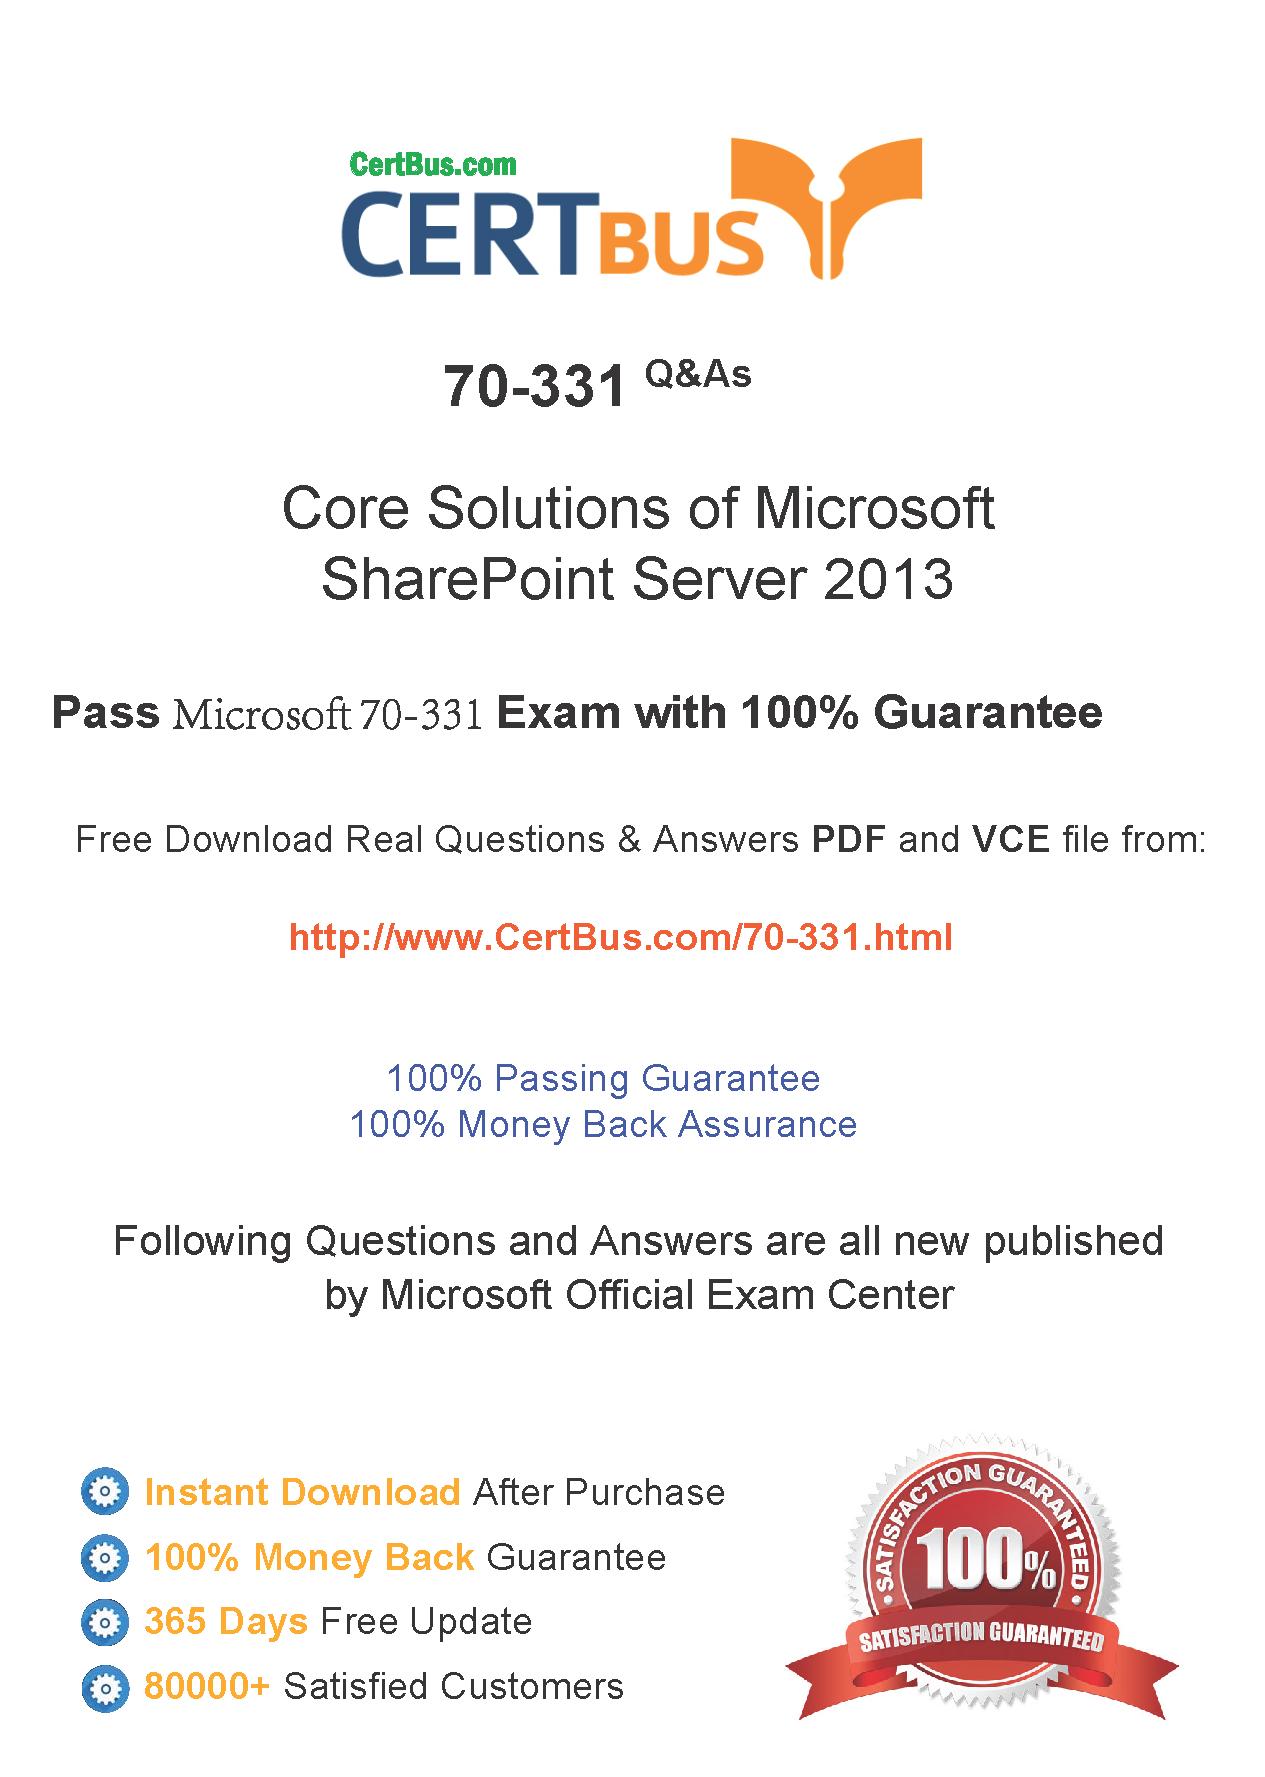 70 331 exam dumps with pdf and vce download 31 60 70 331 exam 70 331 exam dumps with pdf and vce download 31 60 70 331 exam dumps with pdf and vce download pinterest xflitez Choice Image